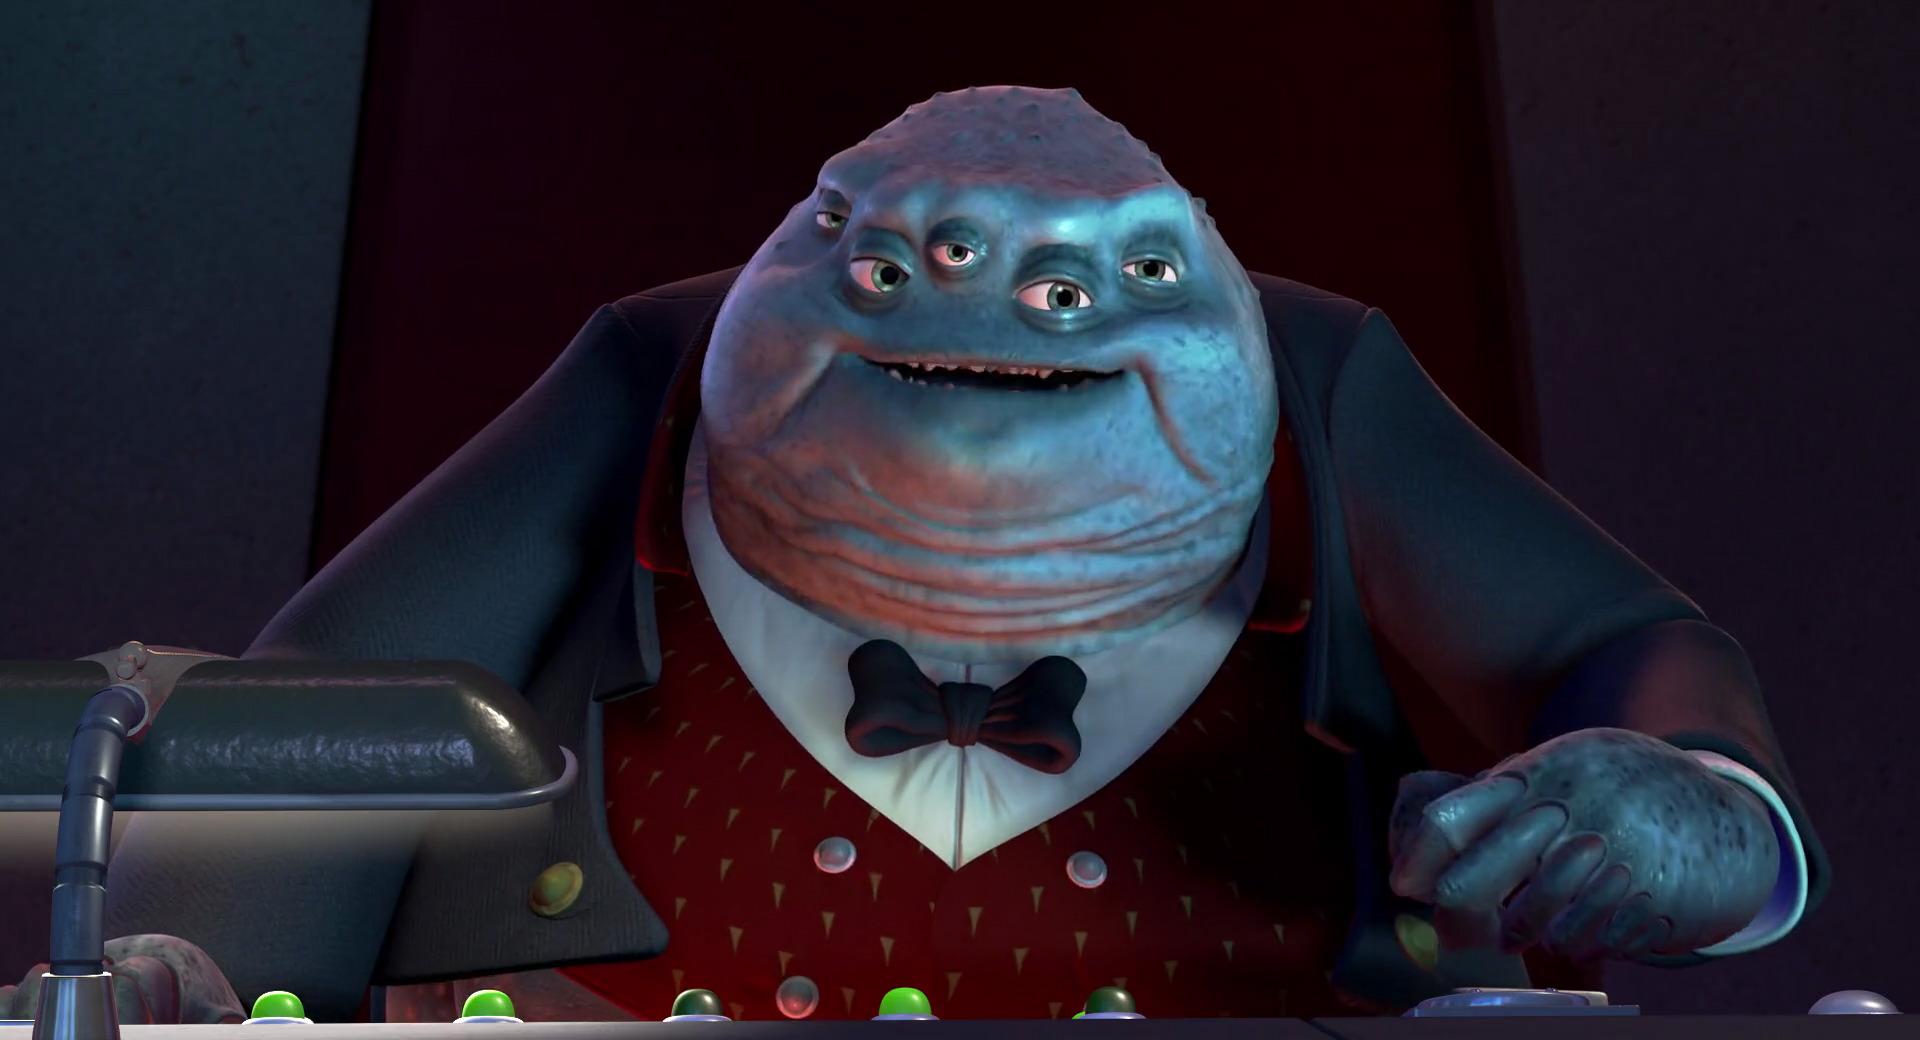 henry james waternoose iii character from monsters inc pixar planet fr. Black Bedroom Furniture Sets. Home Design Ideas